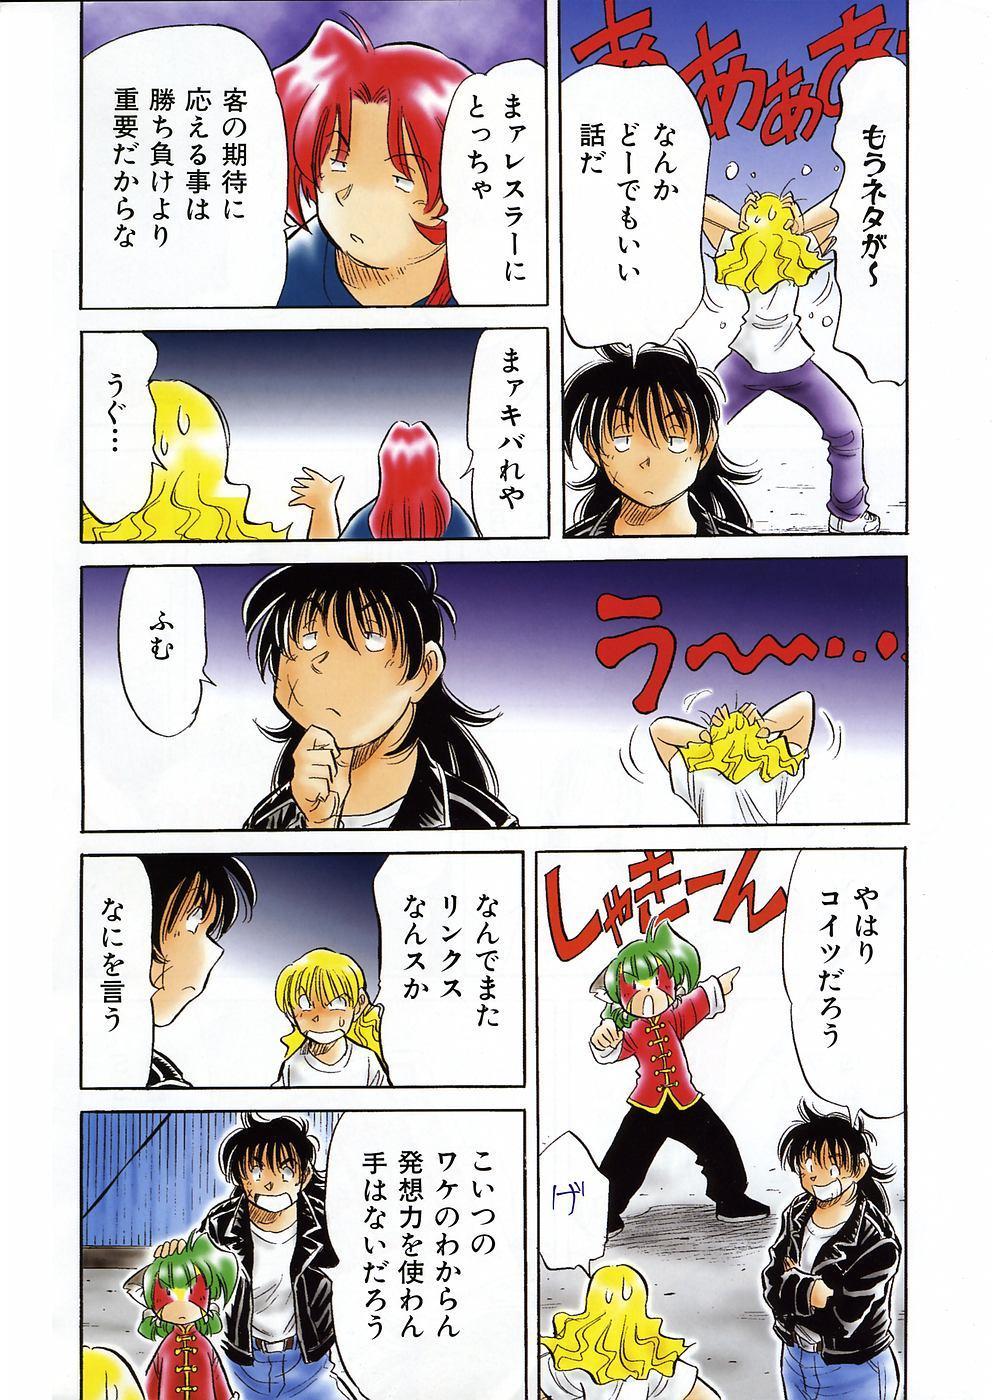 COMIC AUN 2005-12 Vol. 115 408